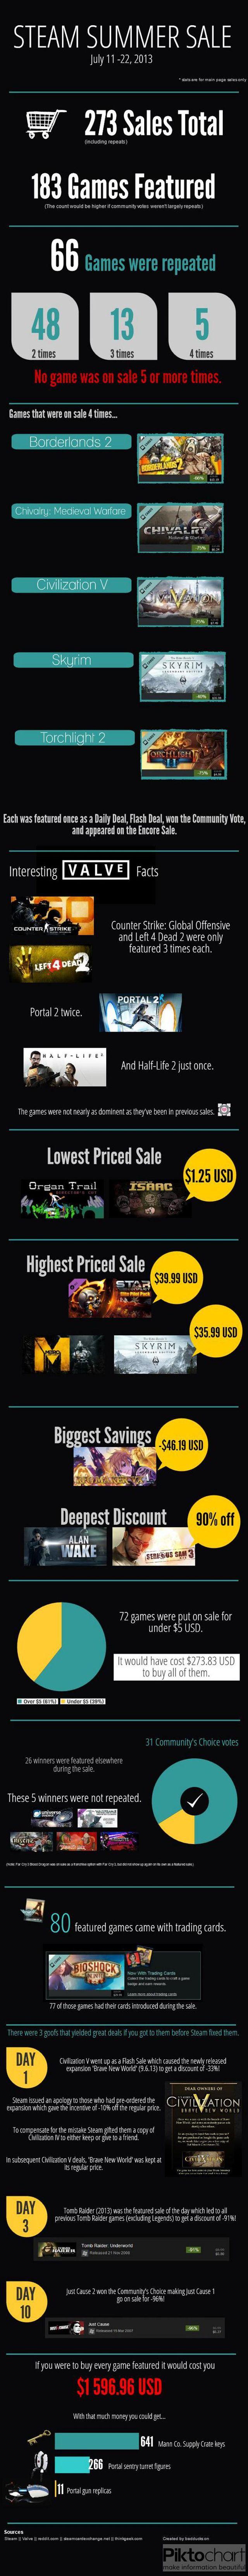 Steam summer sale statistics | Created in #free @Piktochart #Infographic Editor at www.piktochart.com